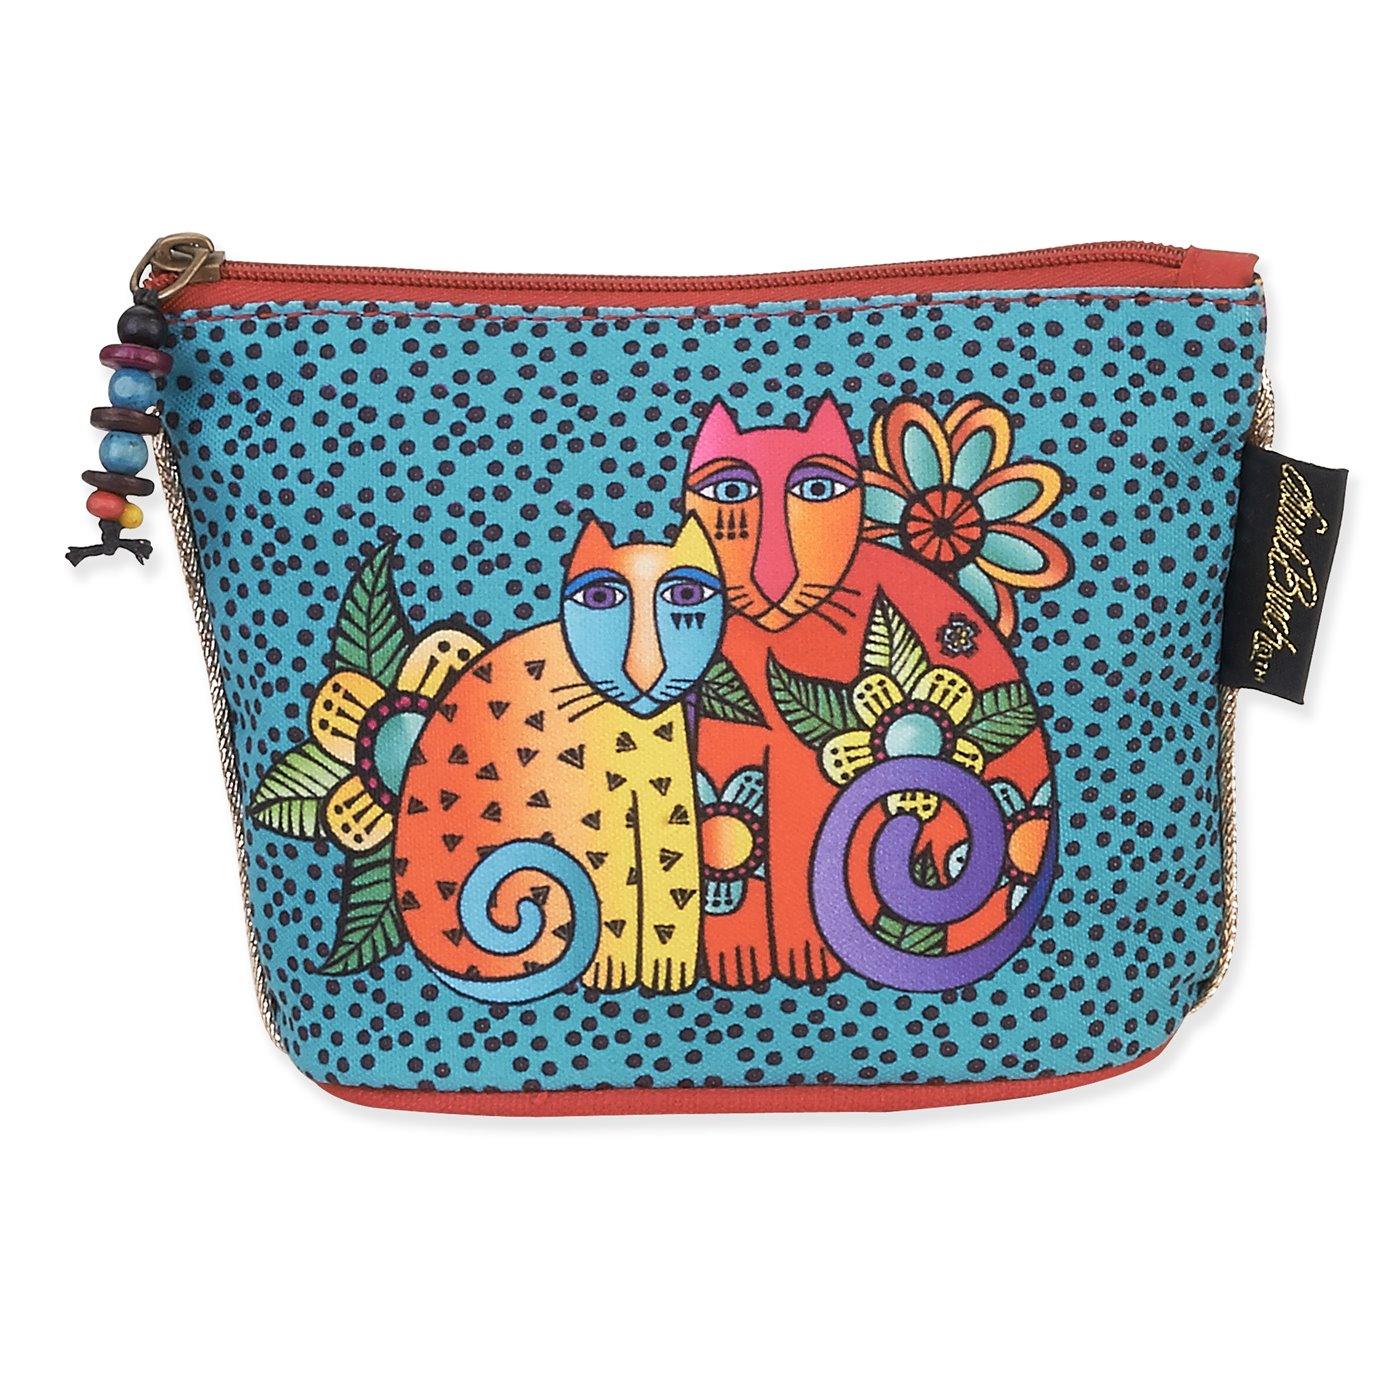 Laurel Burch Feline Mini Cosmetic Bag - polkadot